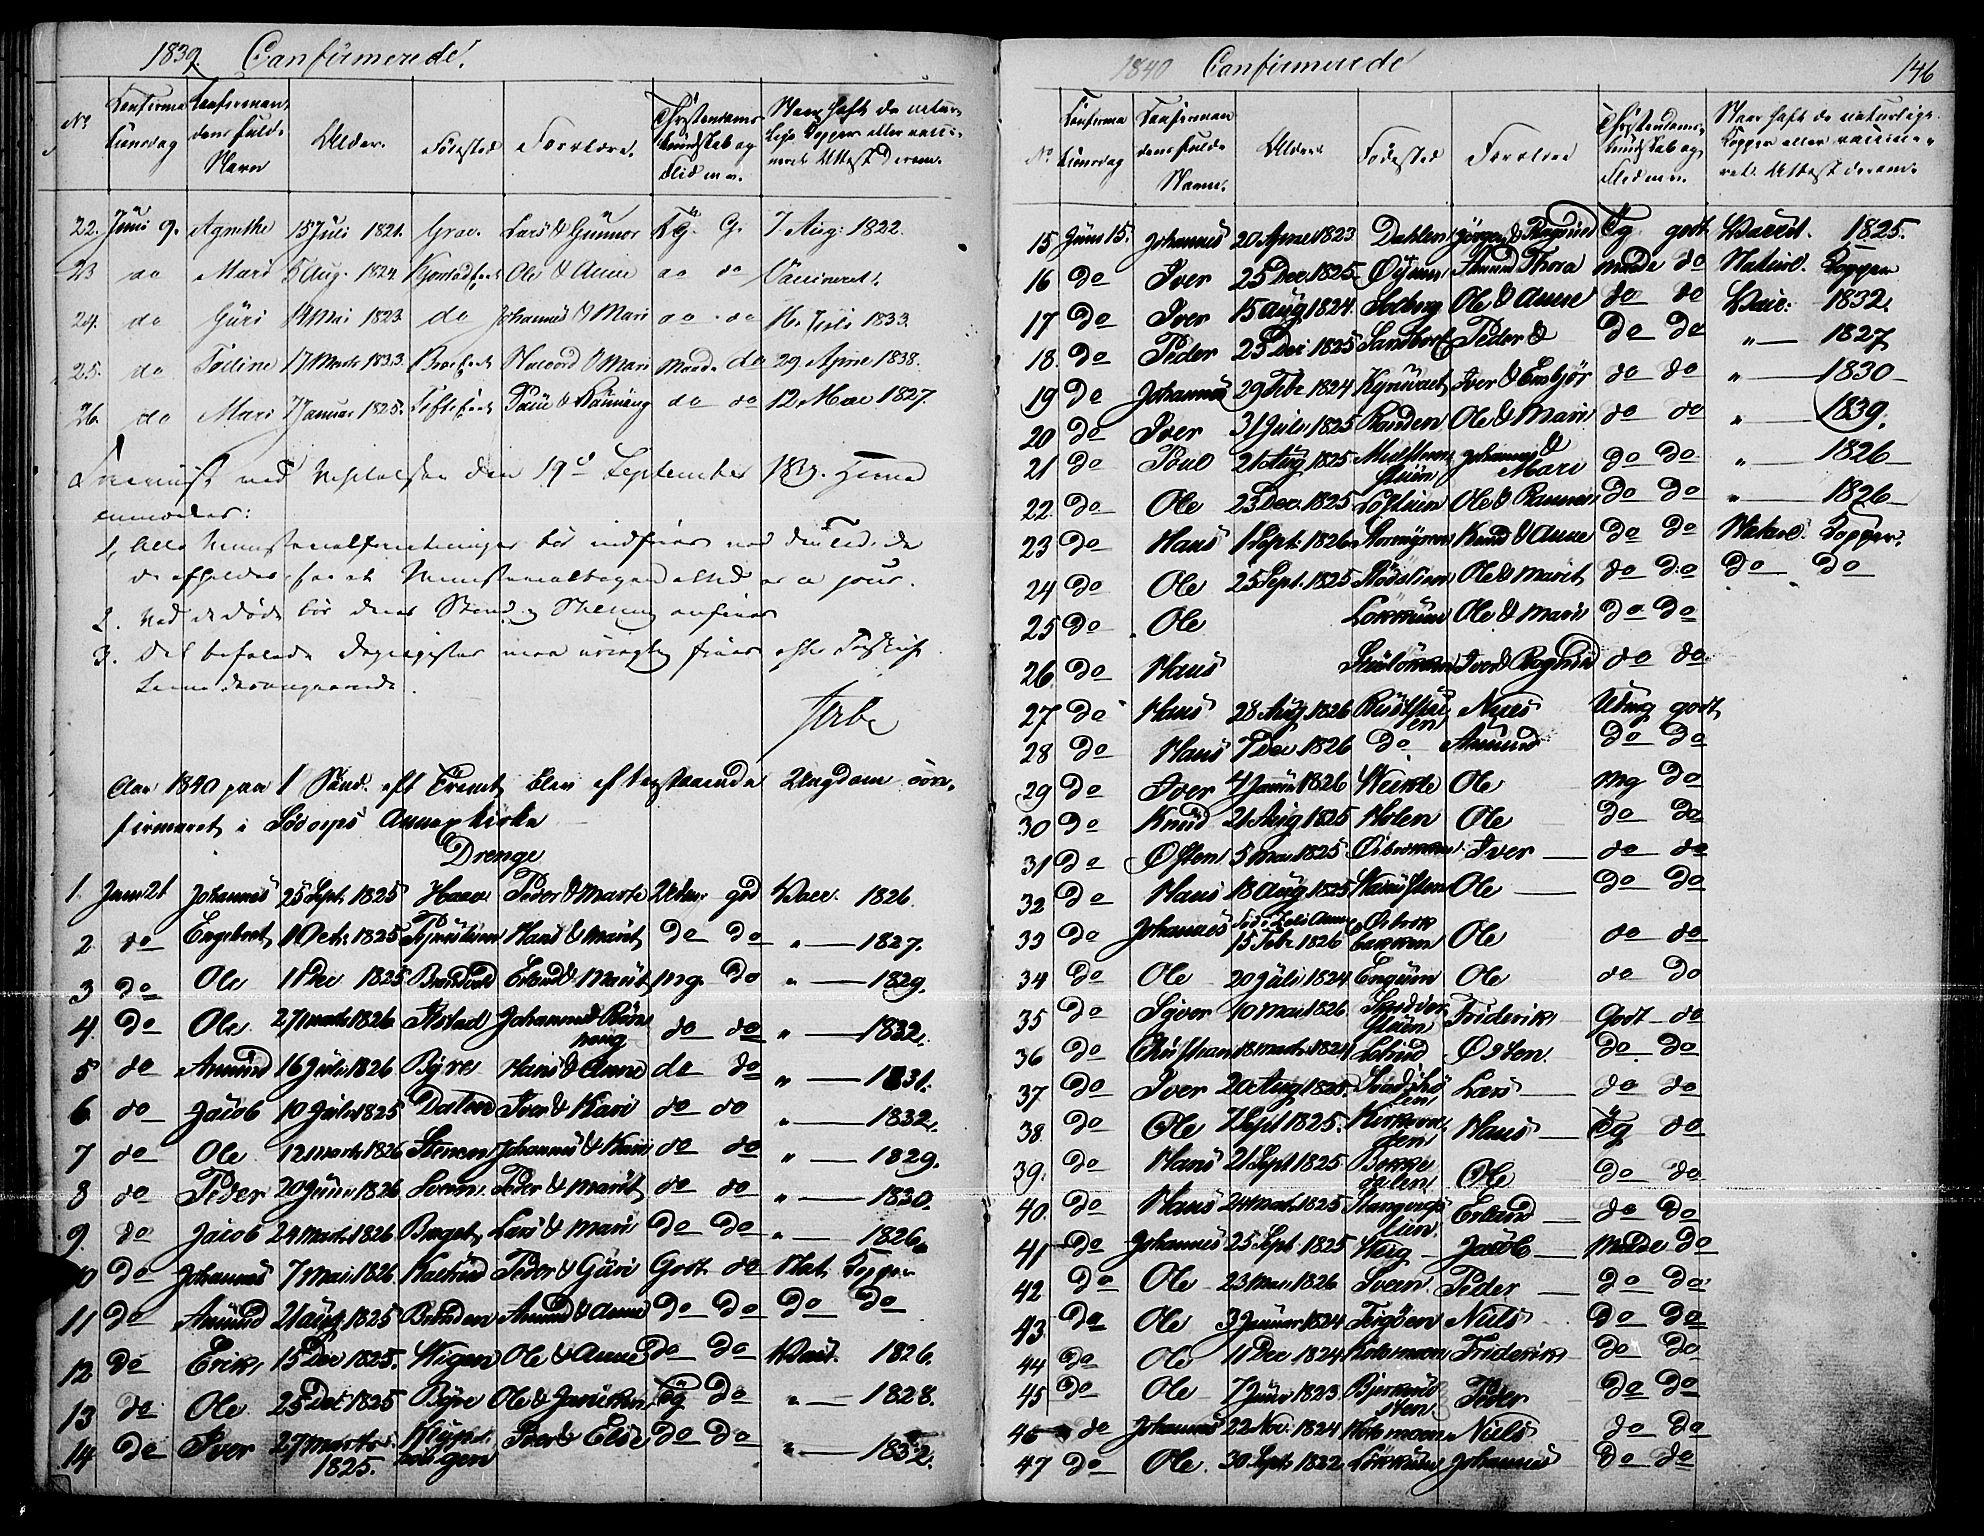 SAH, Fron prestekontor, H/Ha/Haa/L0004: Ministerialbok nr. 4, 1839-1848, s. 146